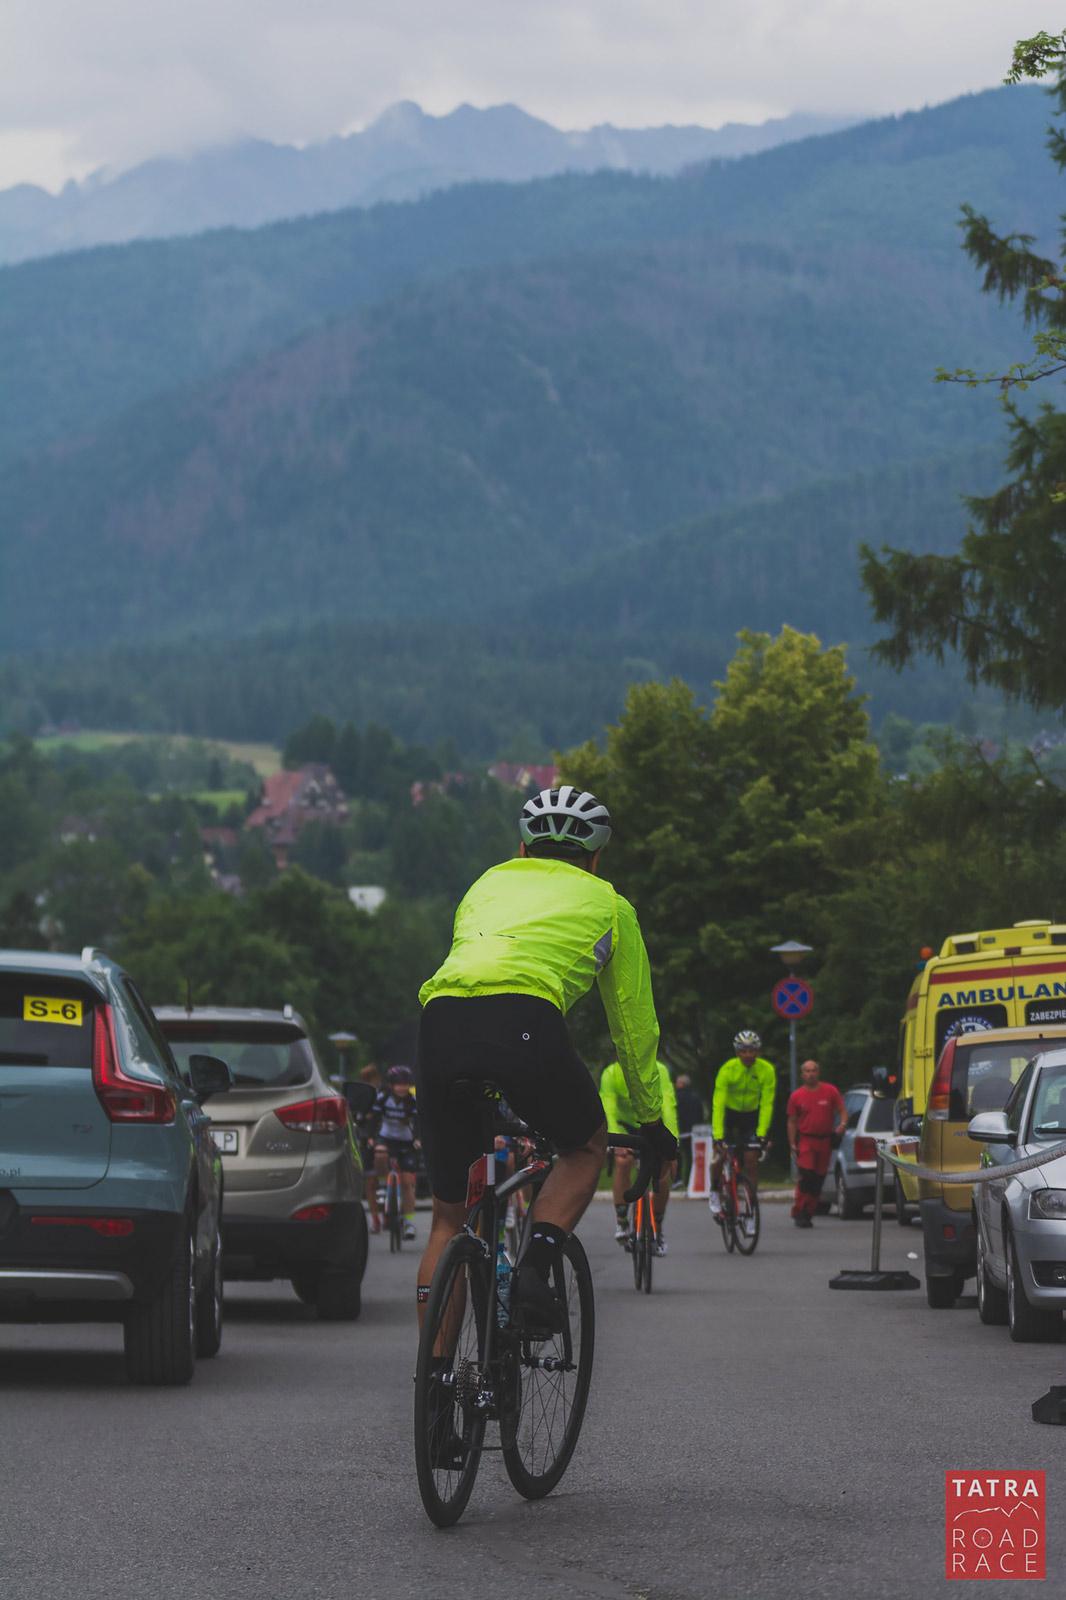 Tatra-Road-Race-3